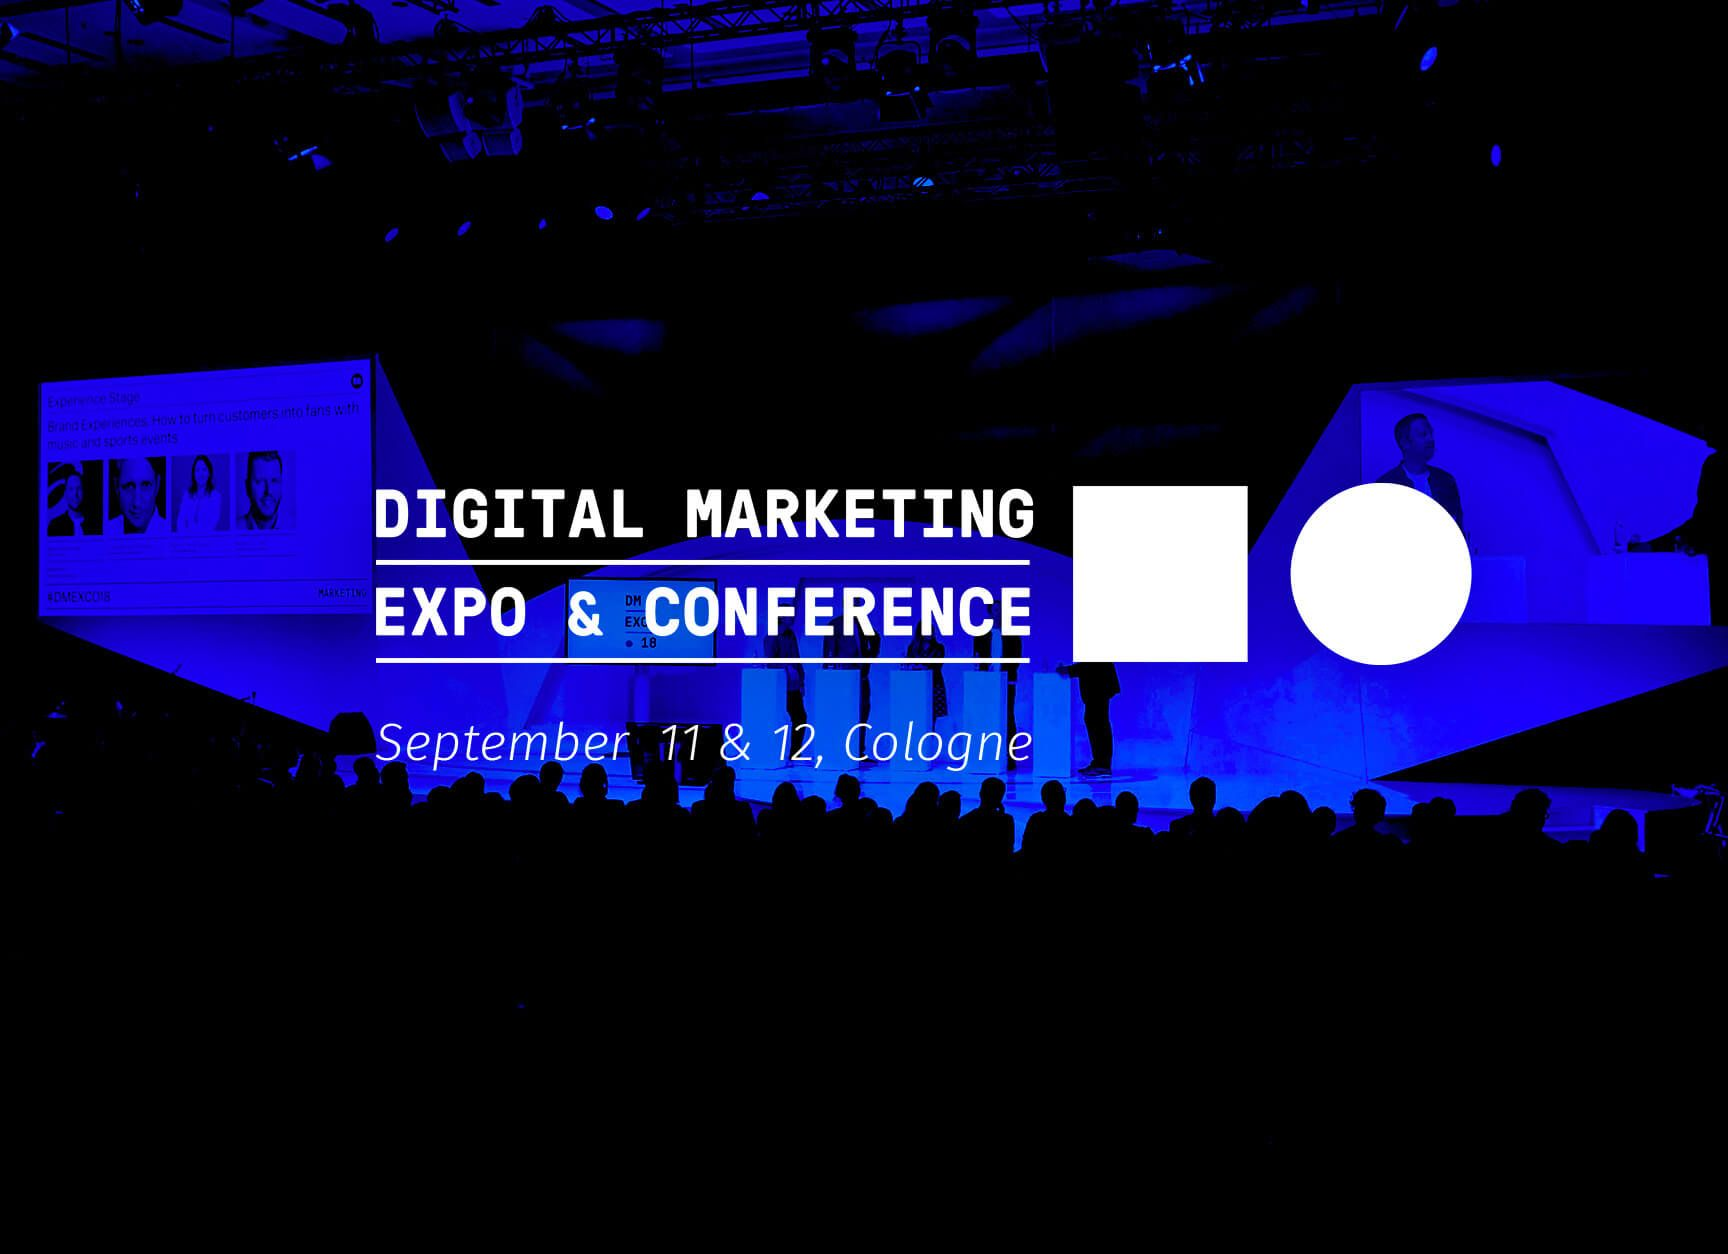 DMEXCO: diva-e beim Hotspot für E-Commerce & Marketing der Zukunft